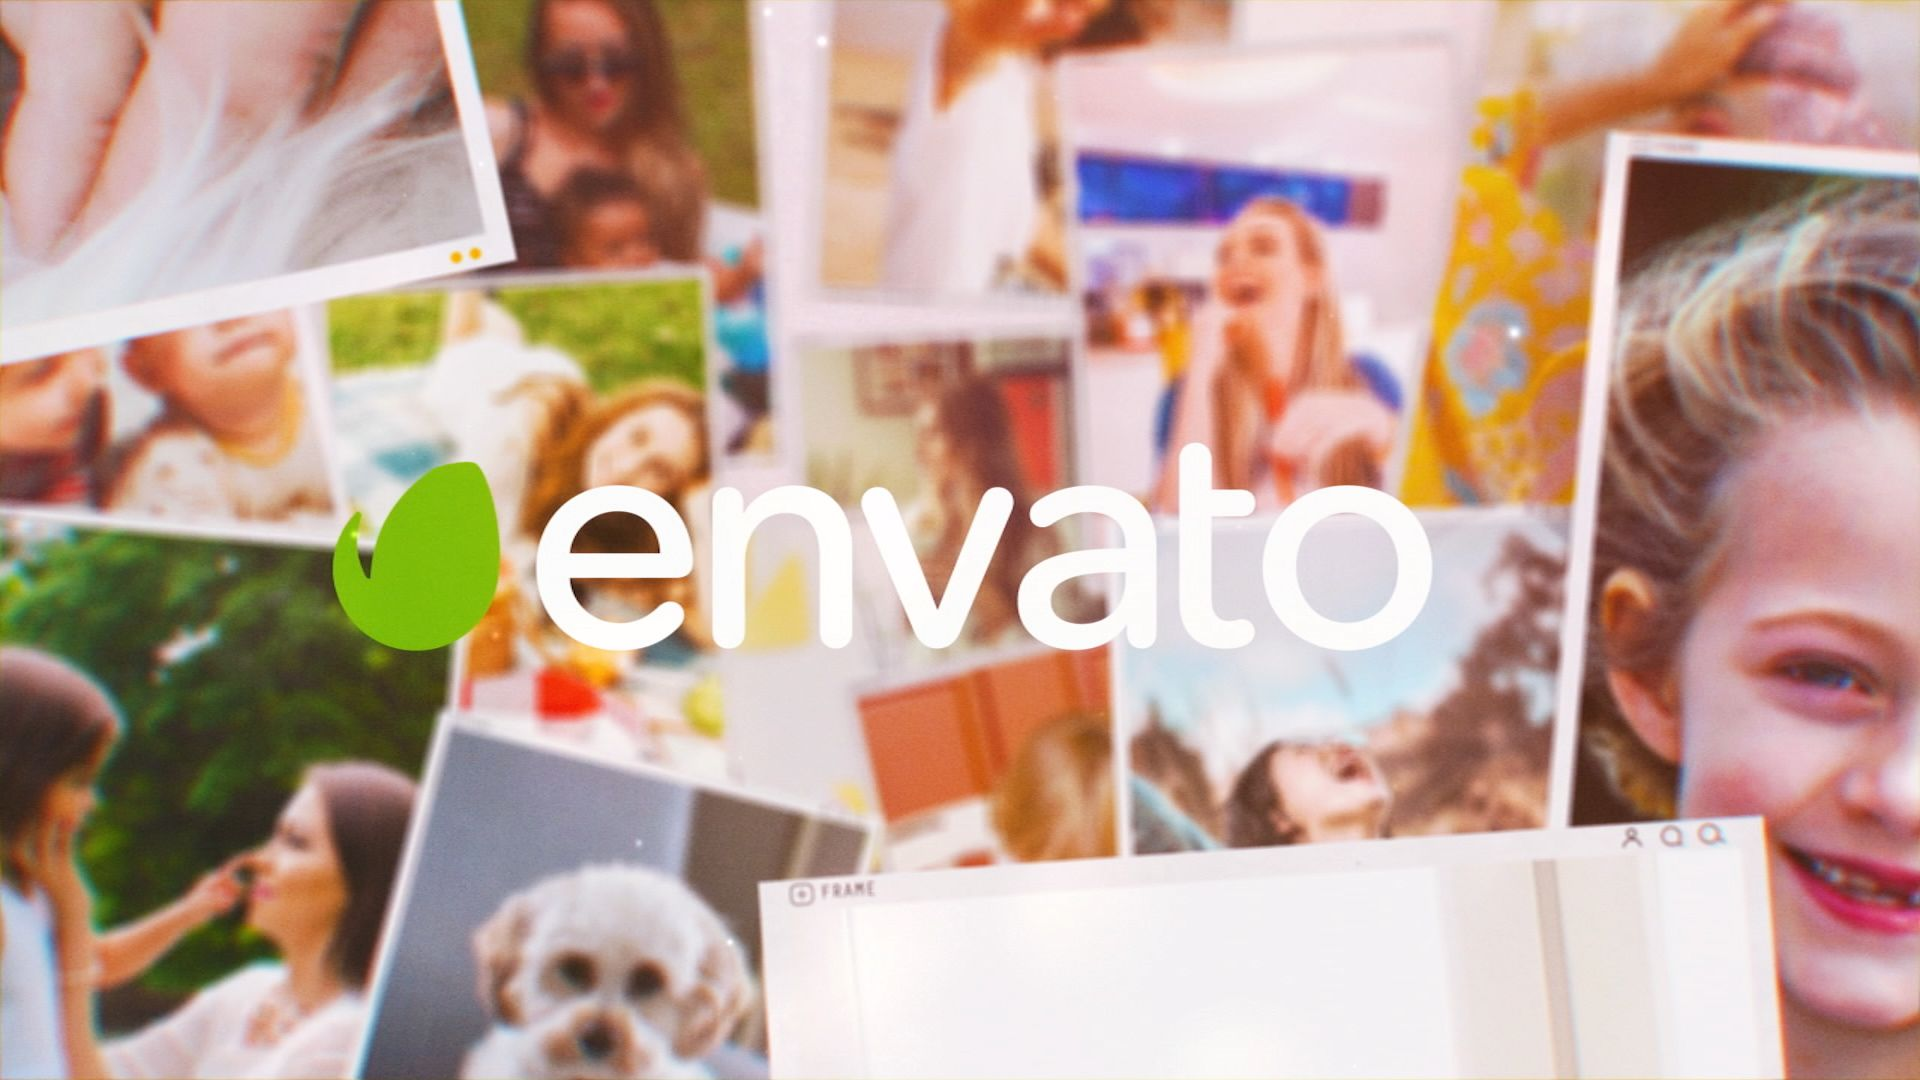 Memories Photo Frames Slideshow #AD #Photo, #Ad, #Memories, #Slideshow, #Frames